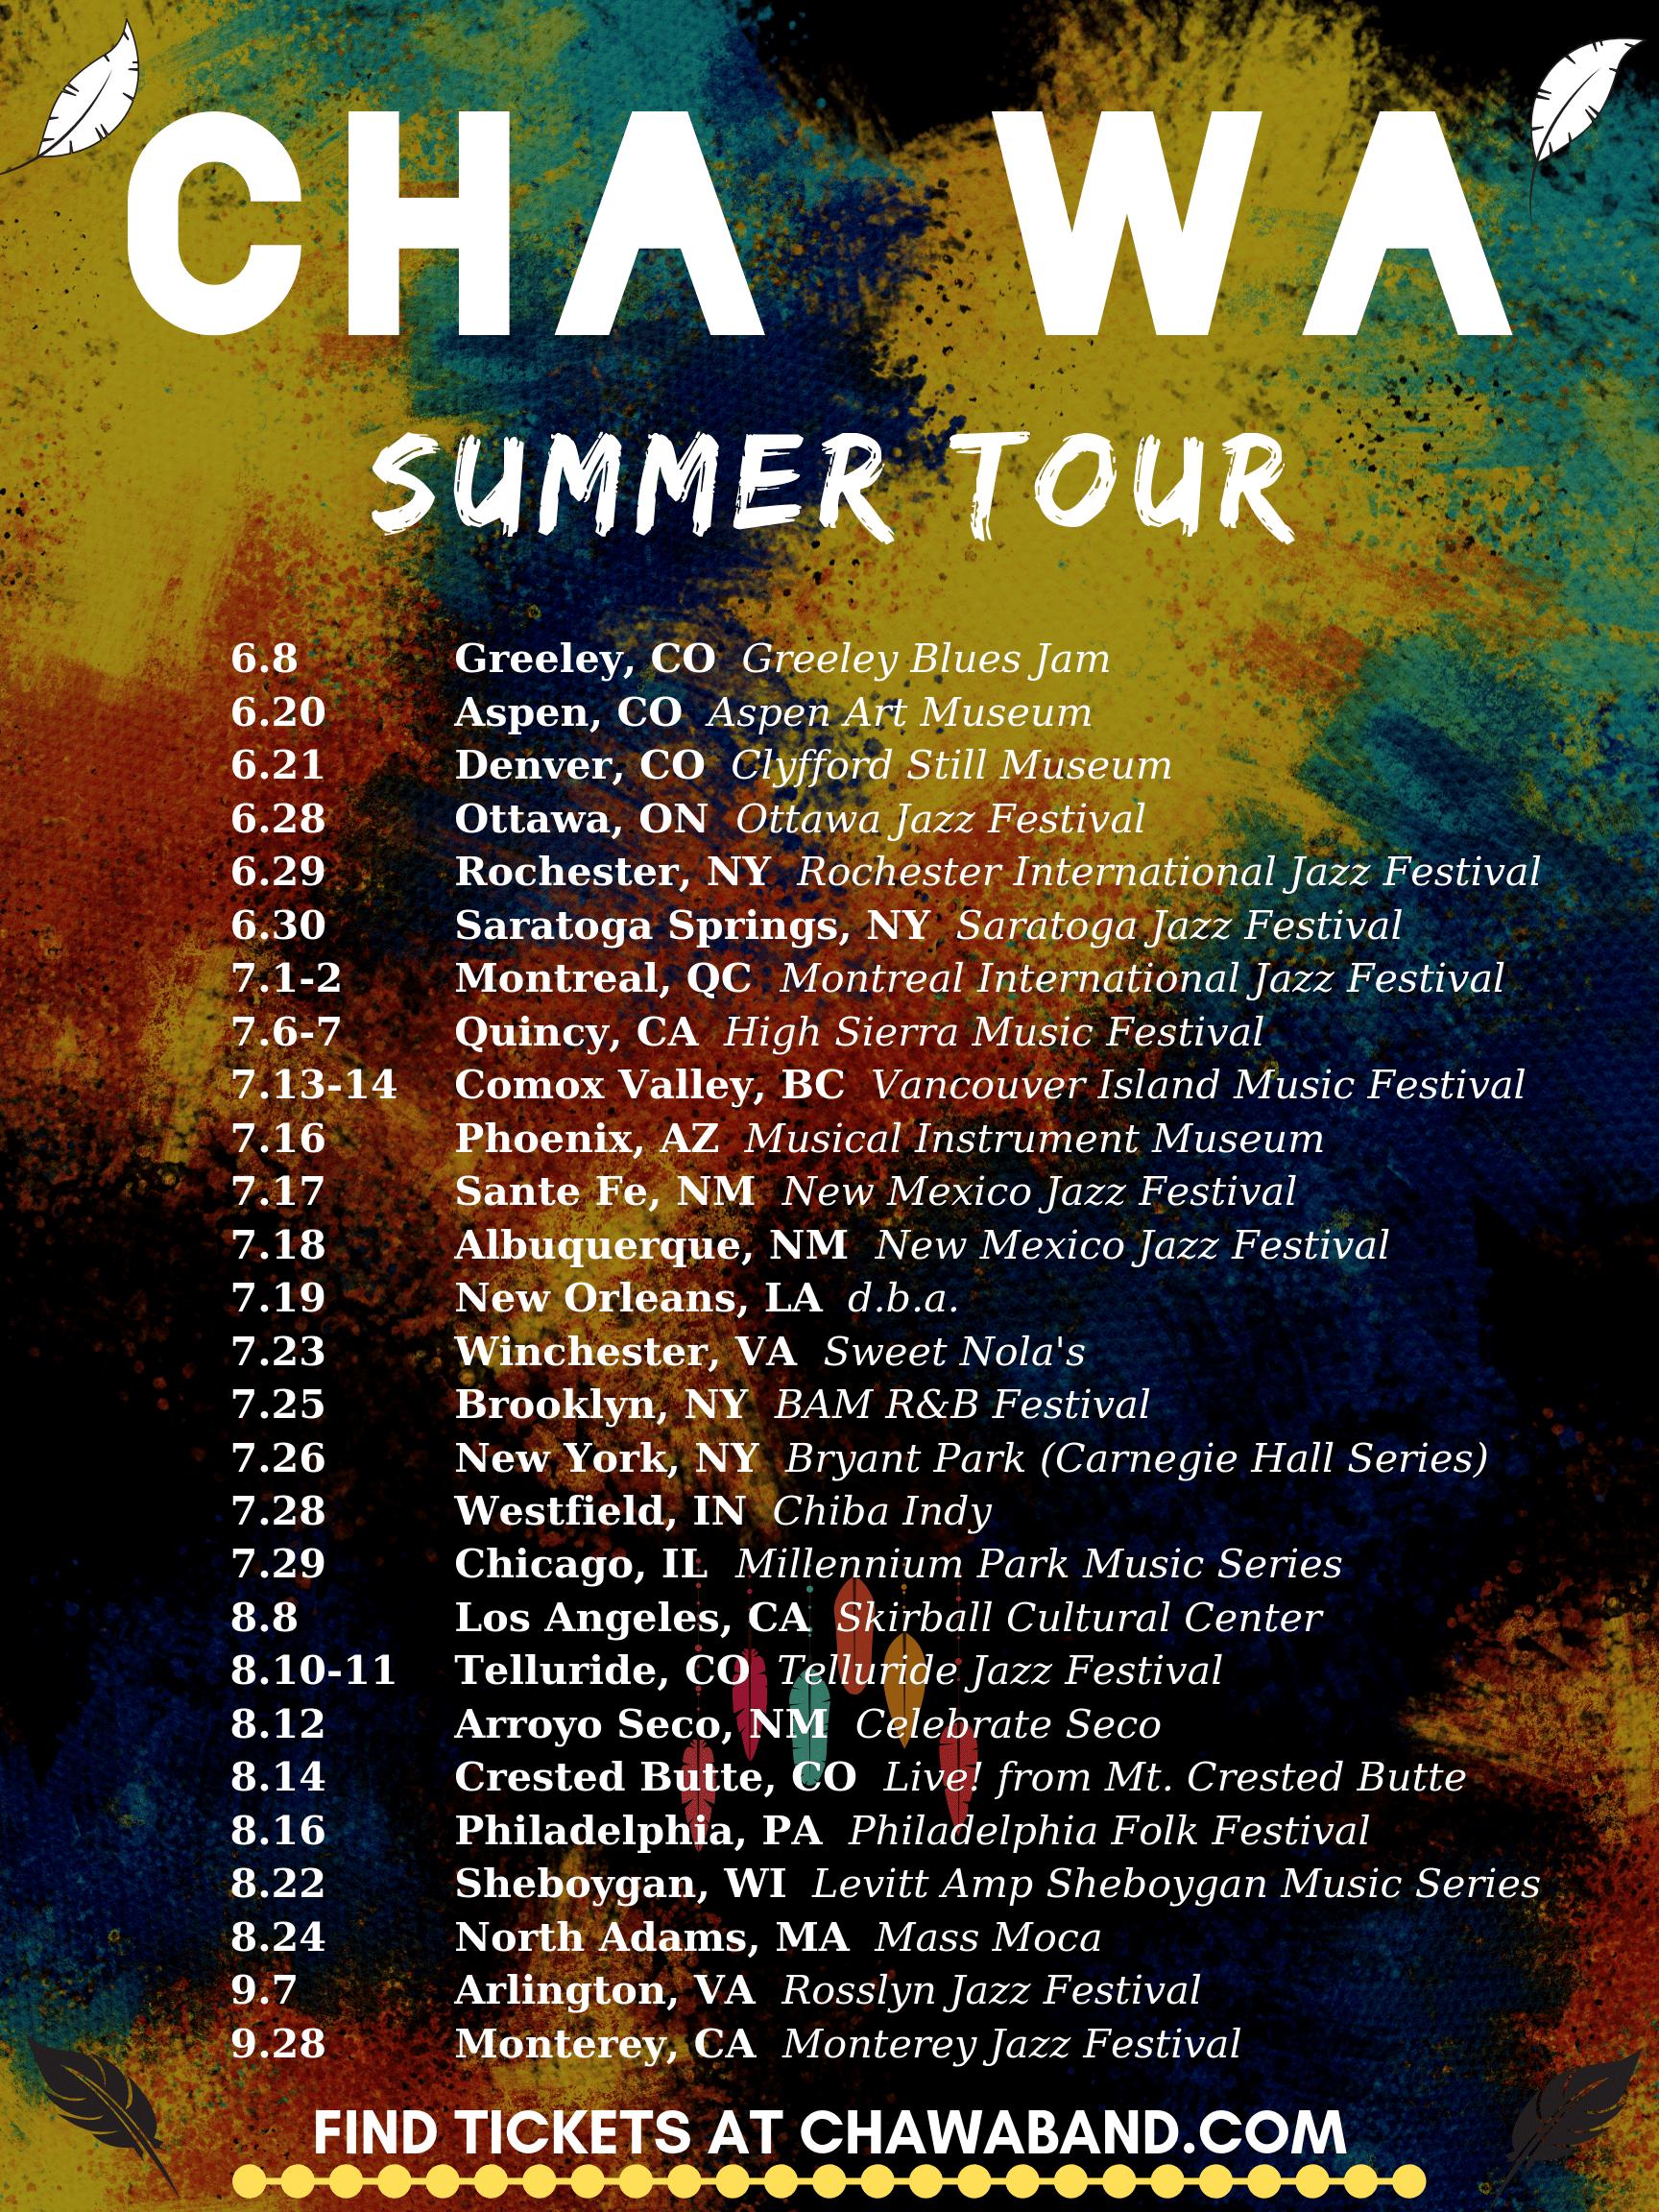 Final Cha Wa 2019 Summer Tour Poster.png